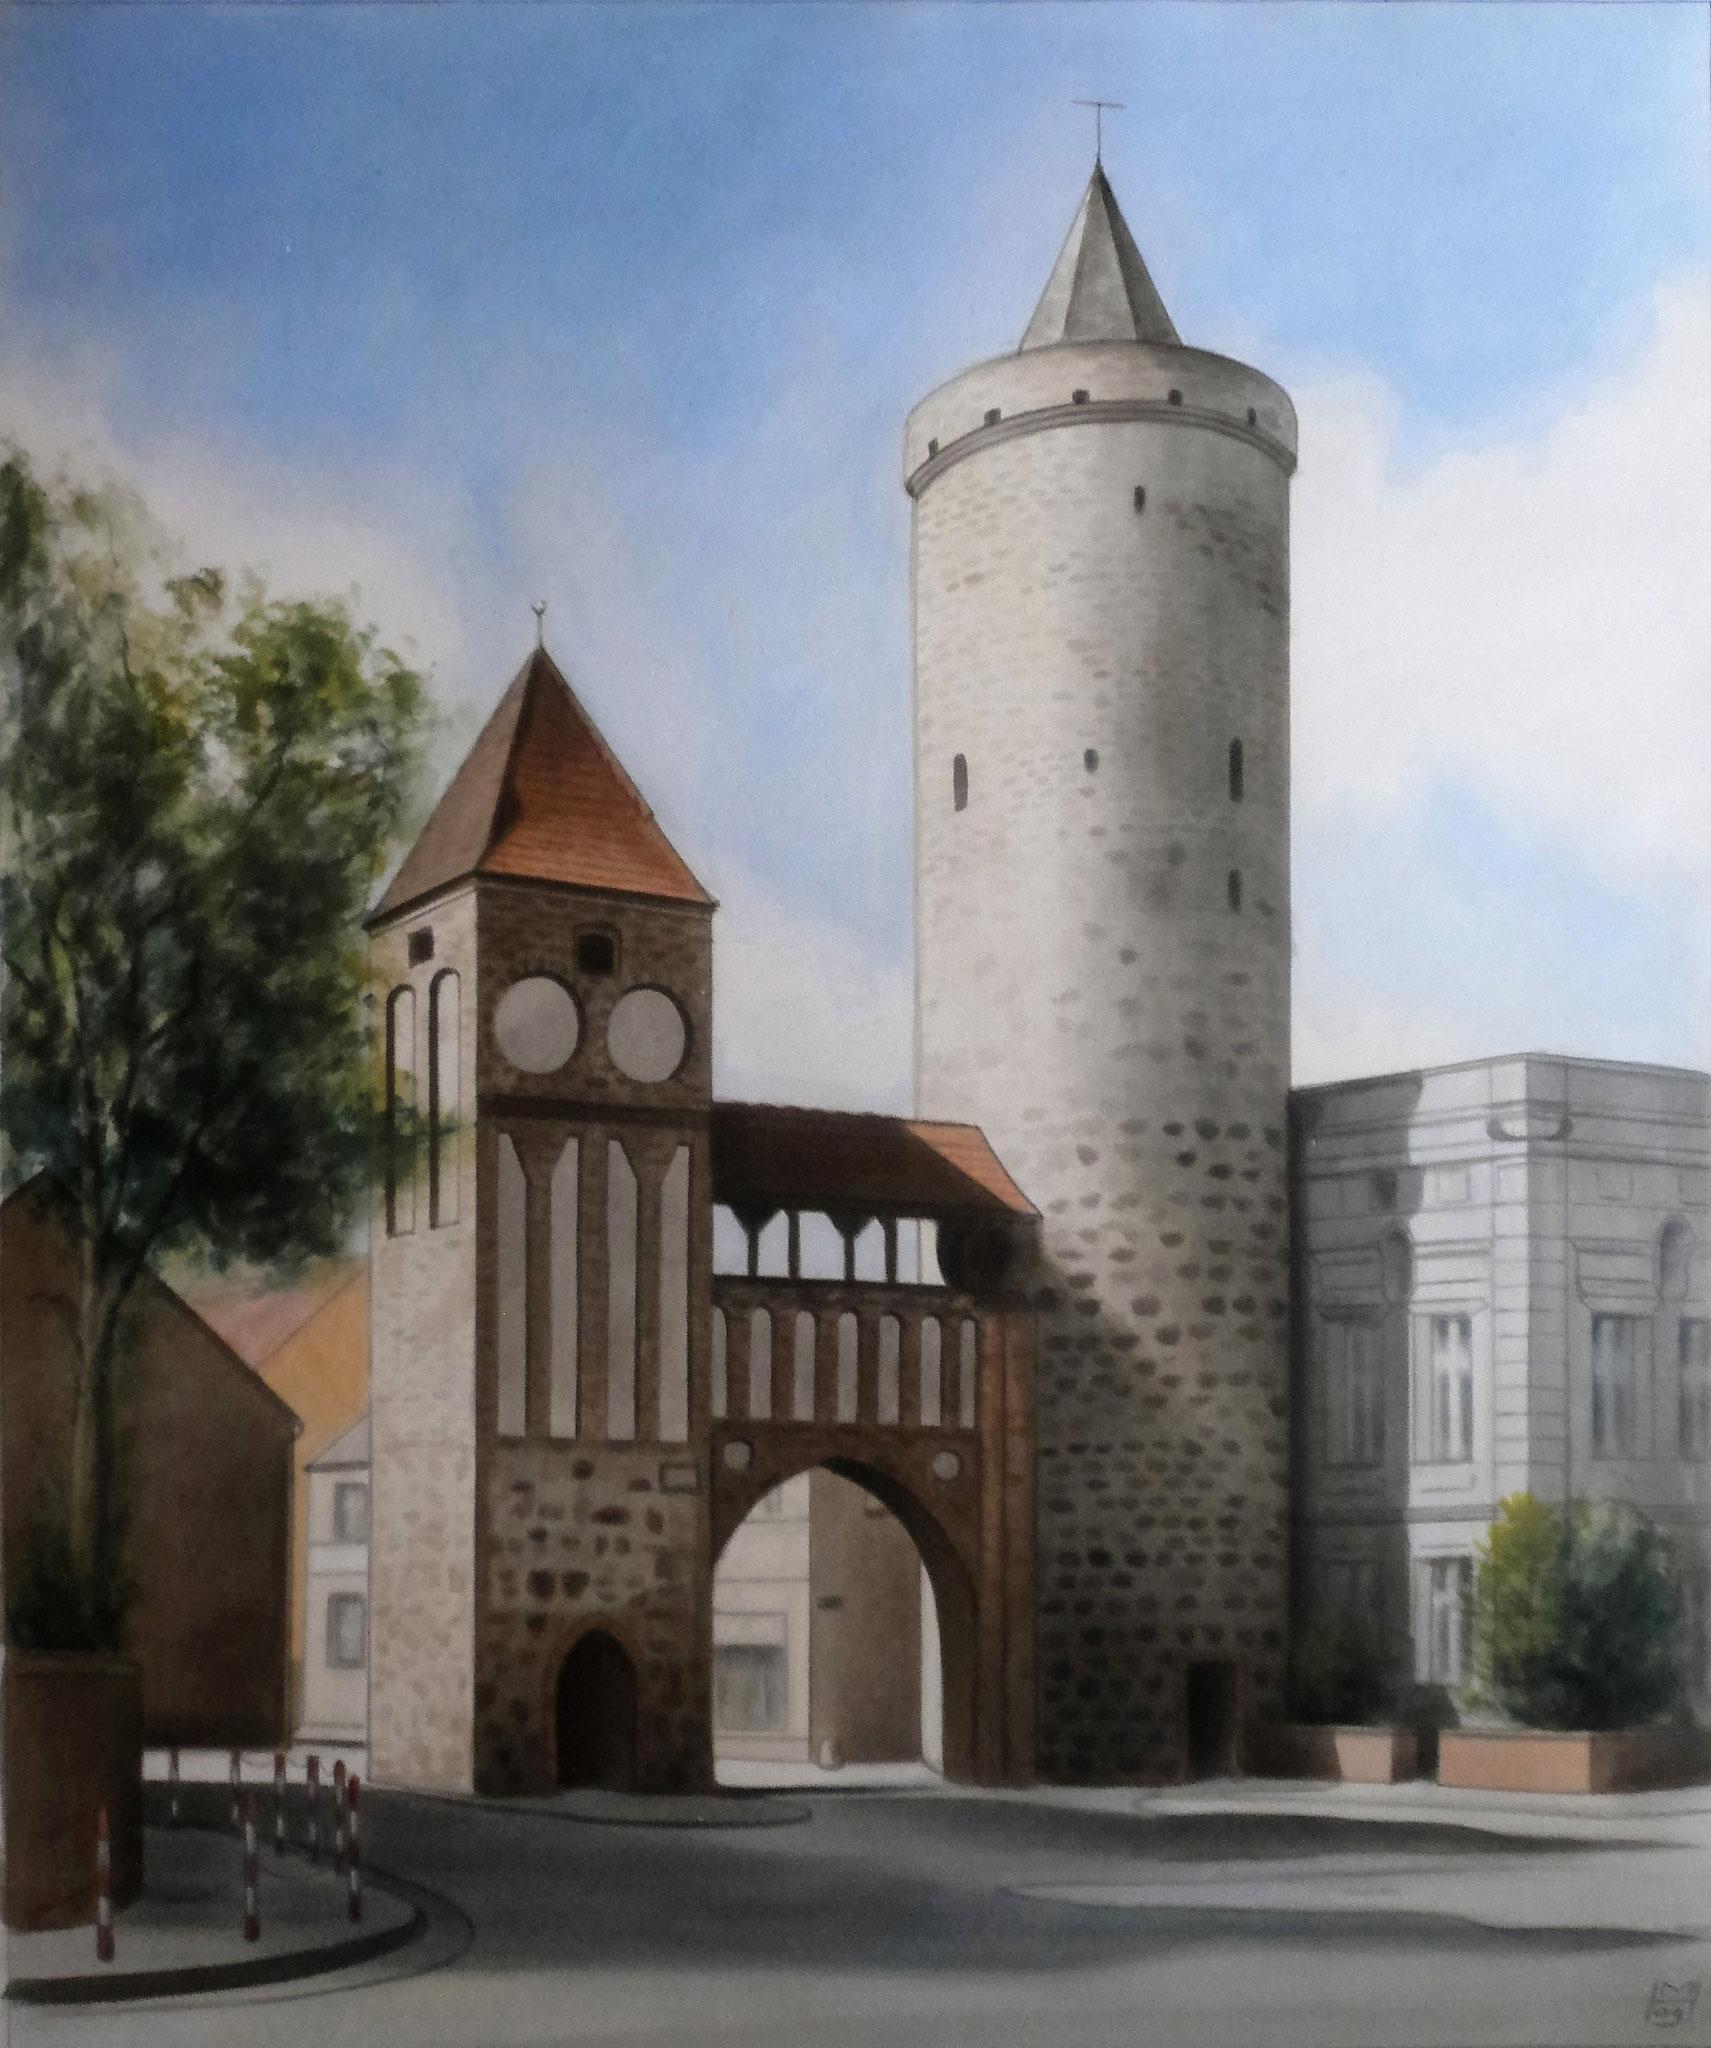 Zinnaer-Tor zu Jüterbog, Akryl auf Leinwand, 104 x 125 cm